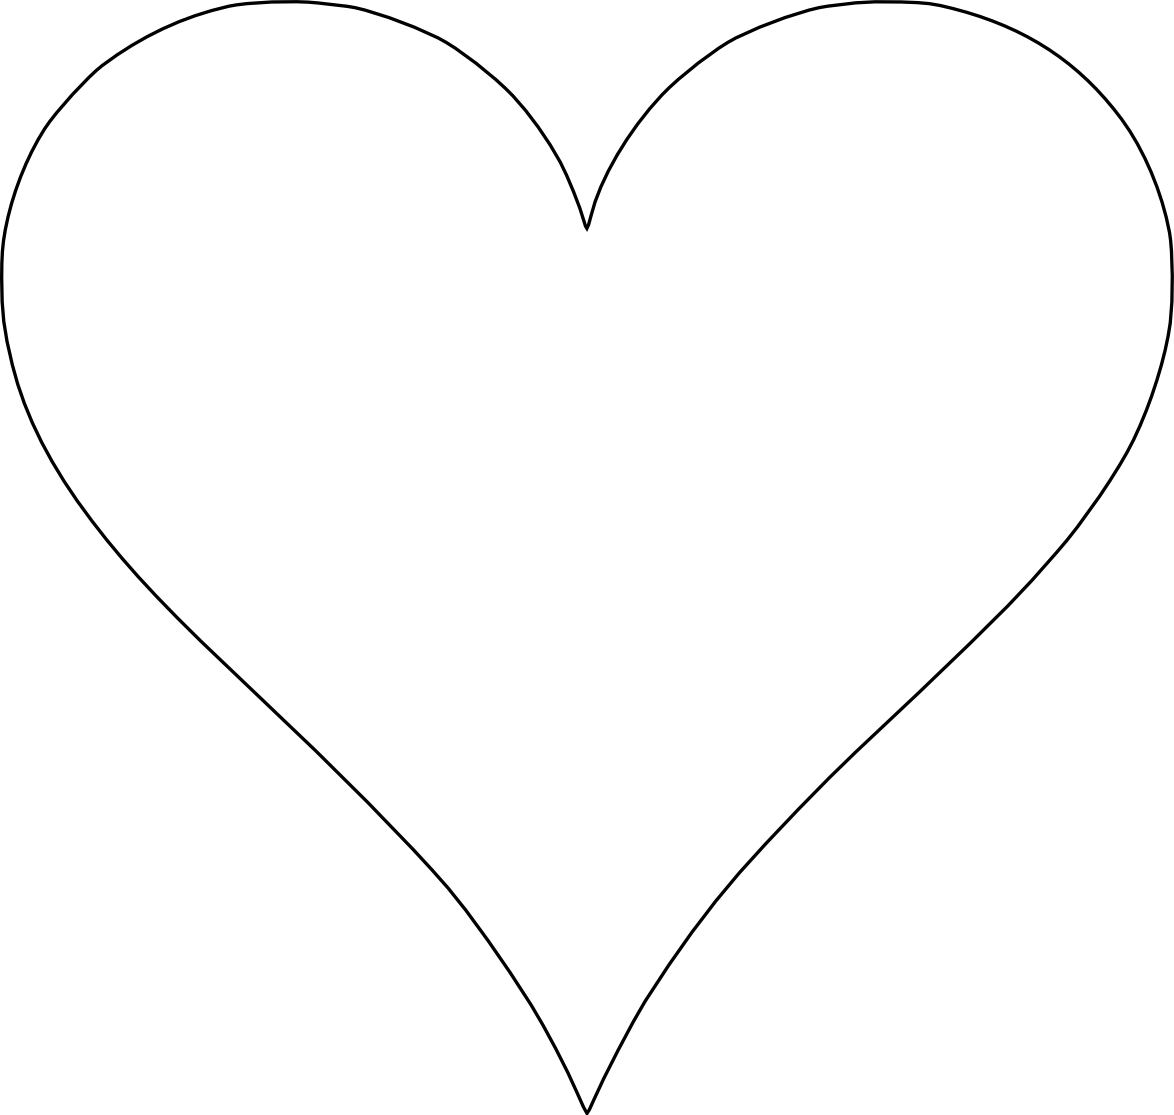 Printable Heart Shape - ClipArt Best